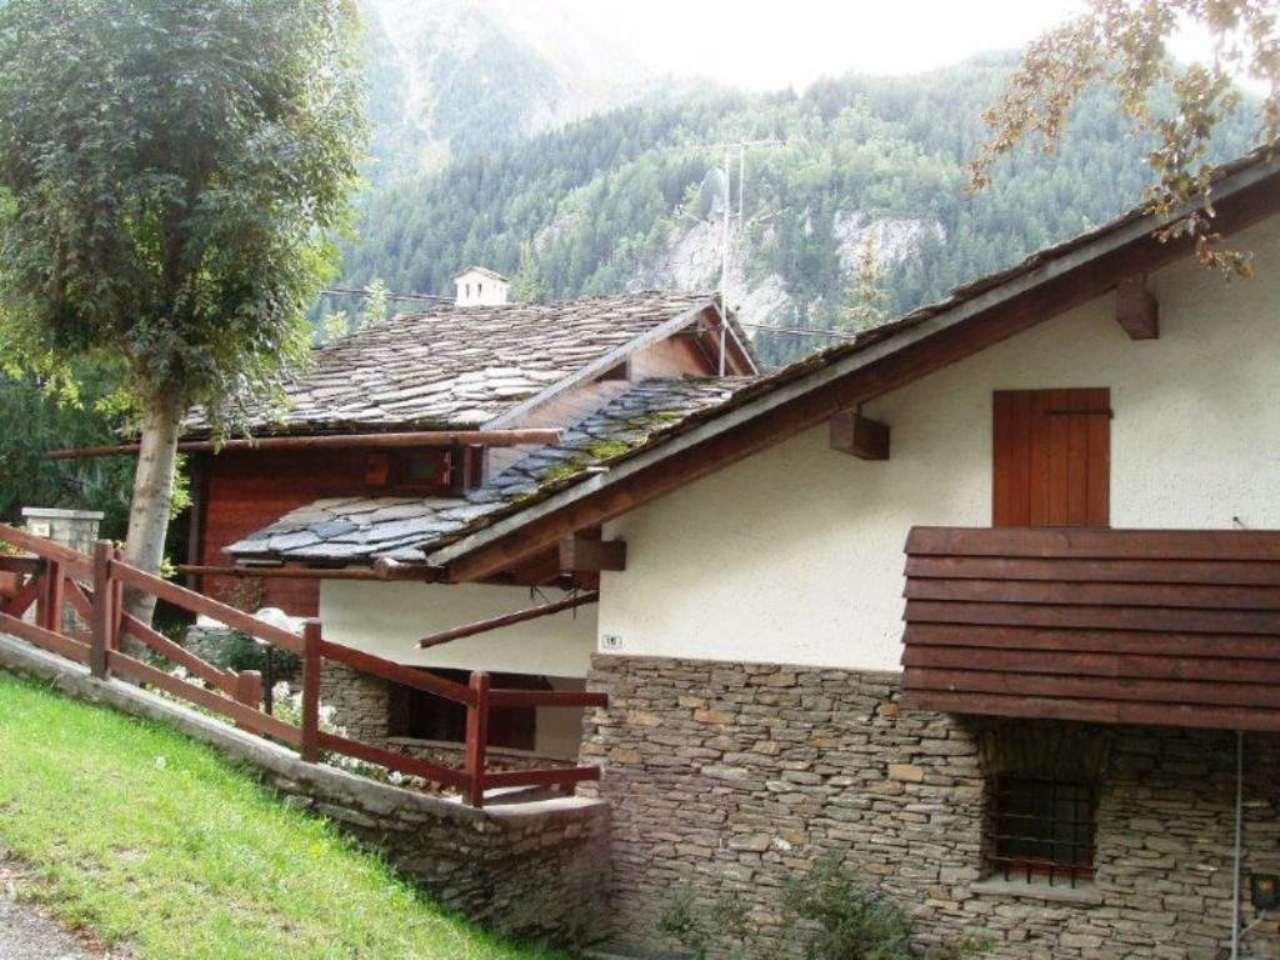 Villa in Vendita a Courmayeur: 5 locali, 450 mq - Foto 5